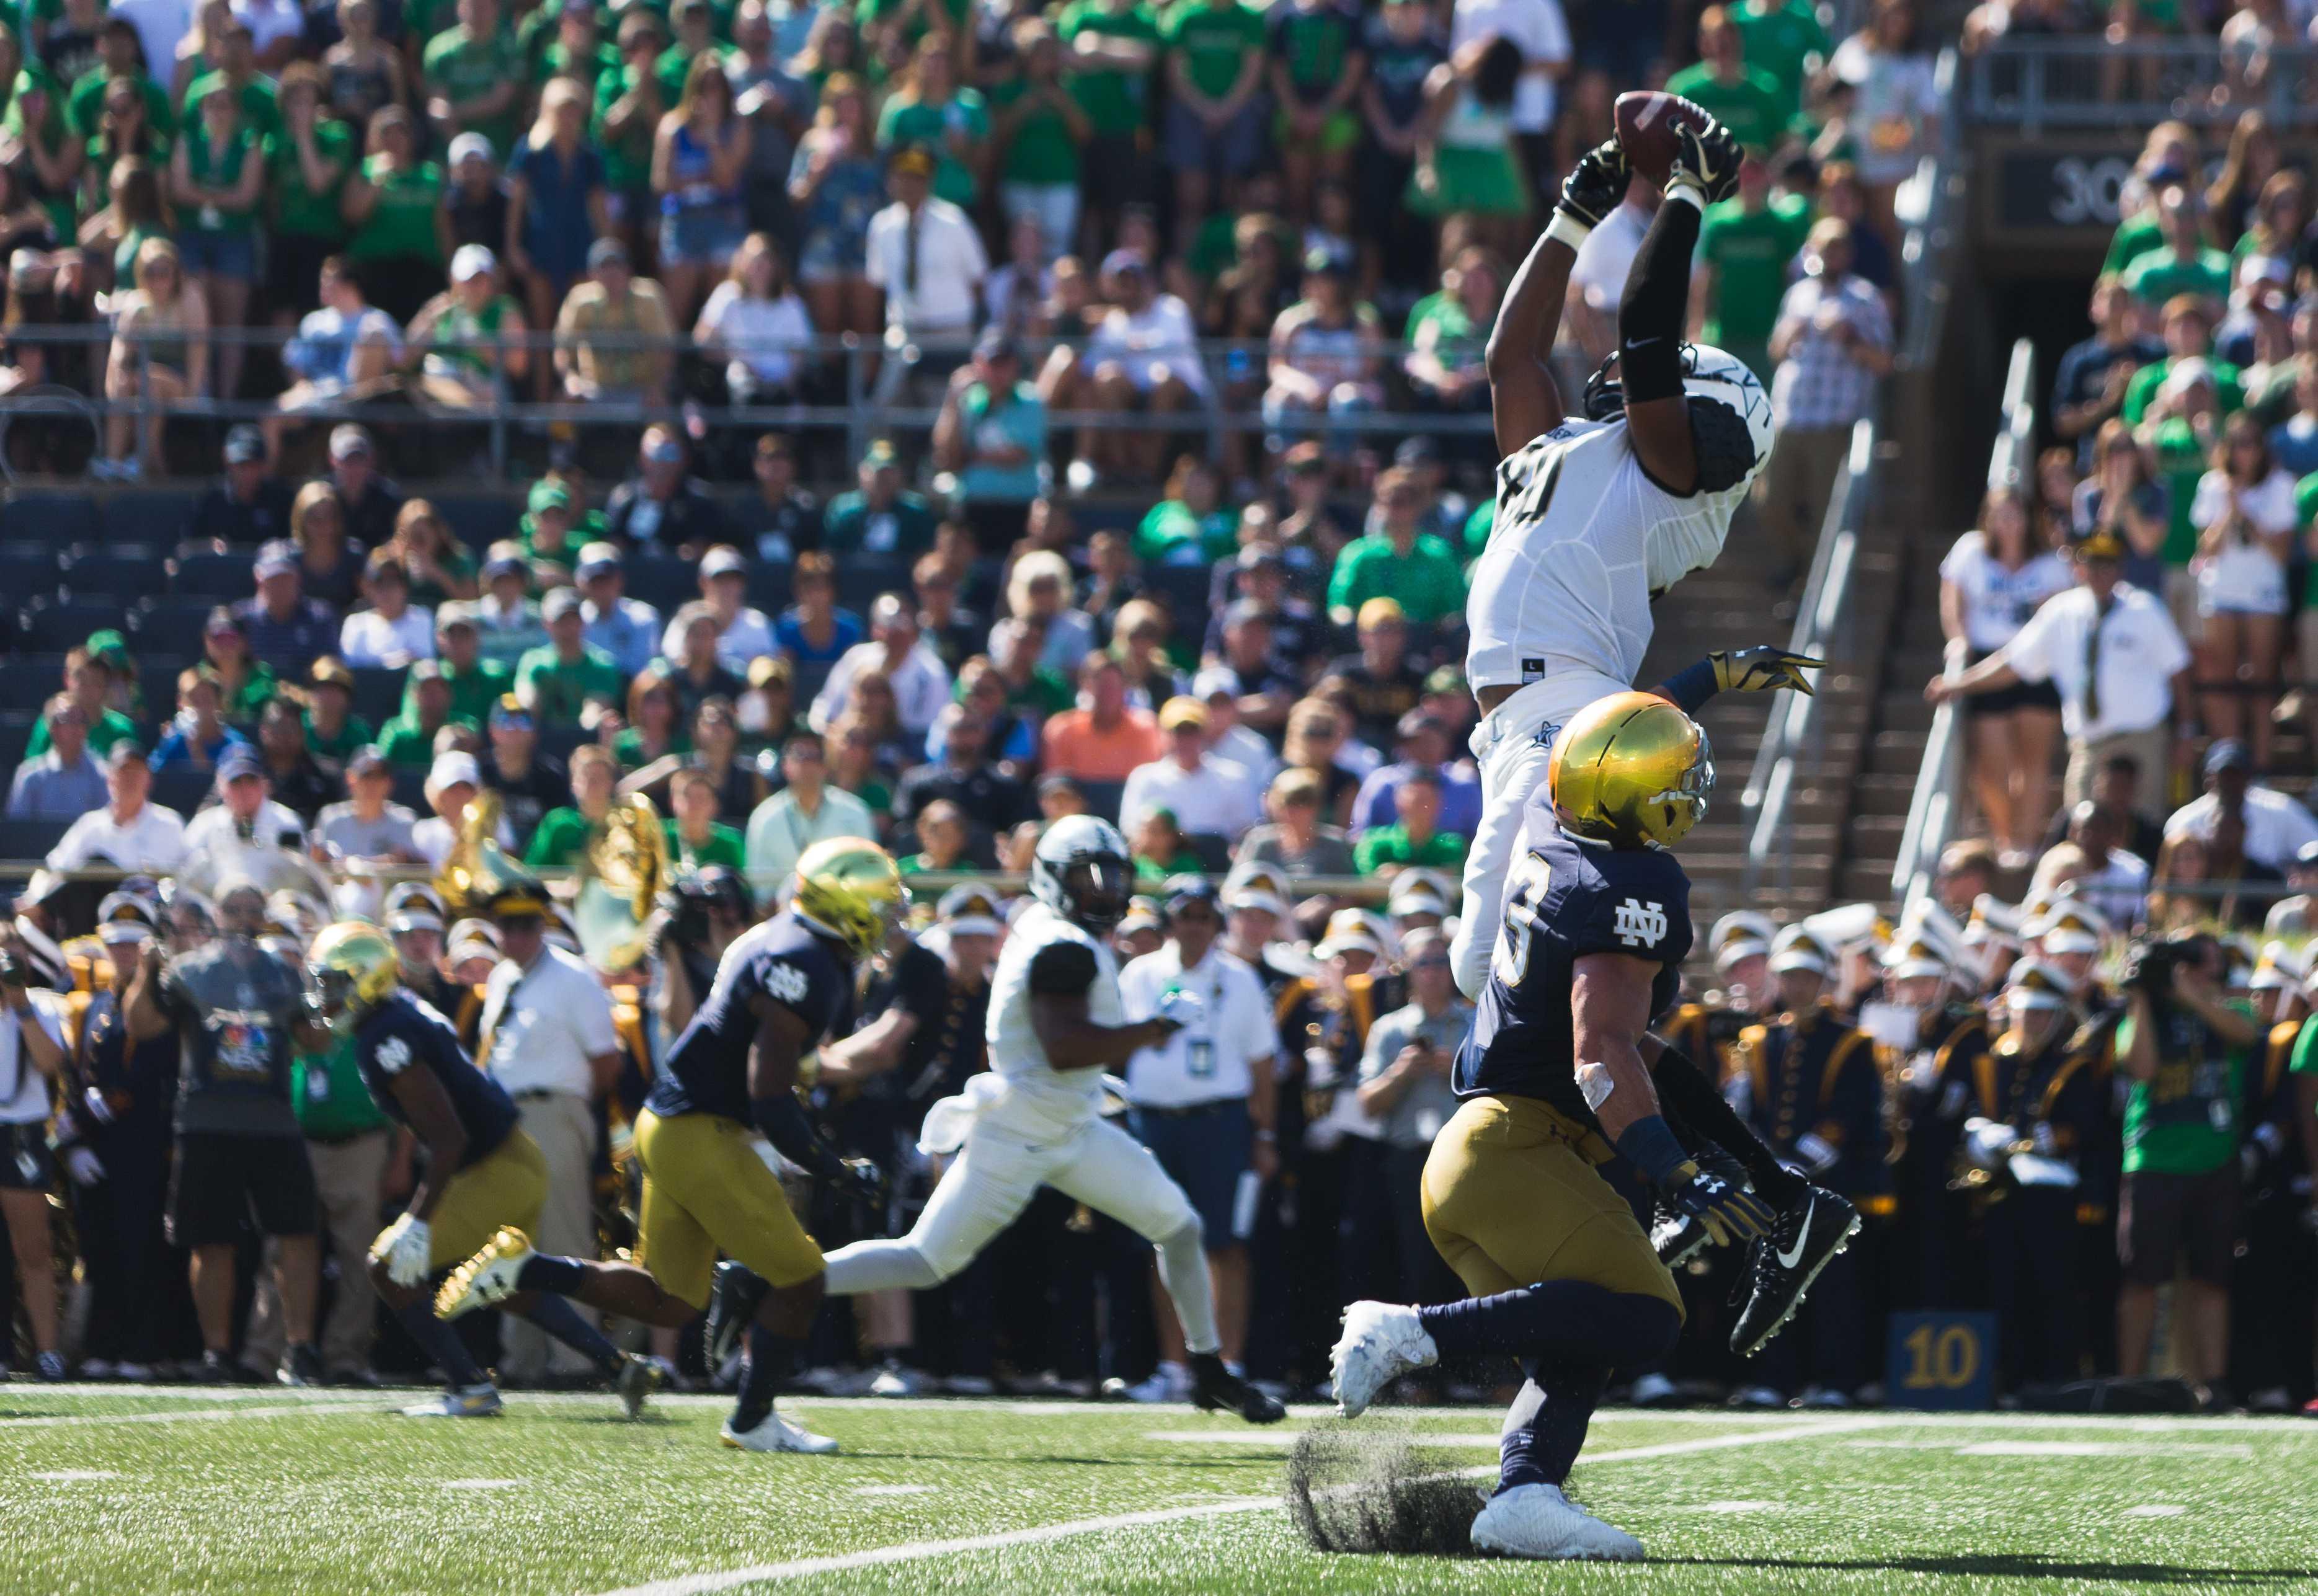 Vanderbilt loses nail-biter to #8 Notre Dame 22-17